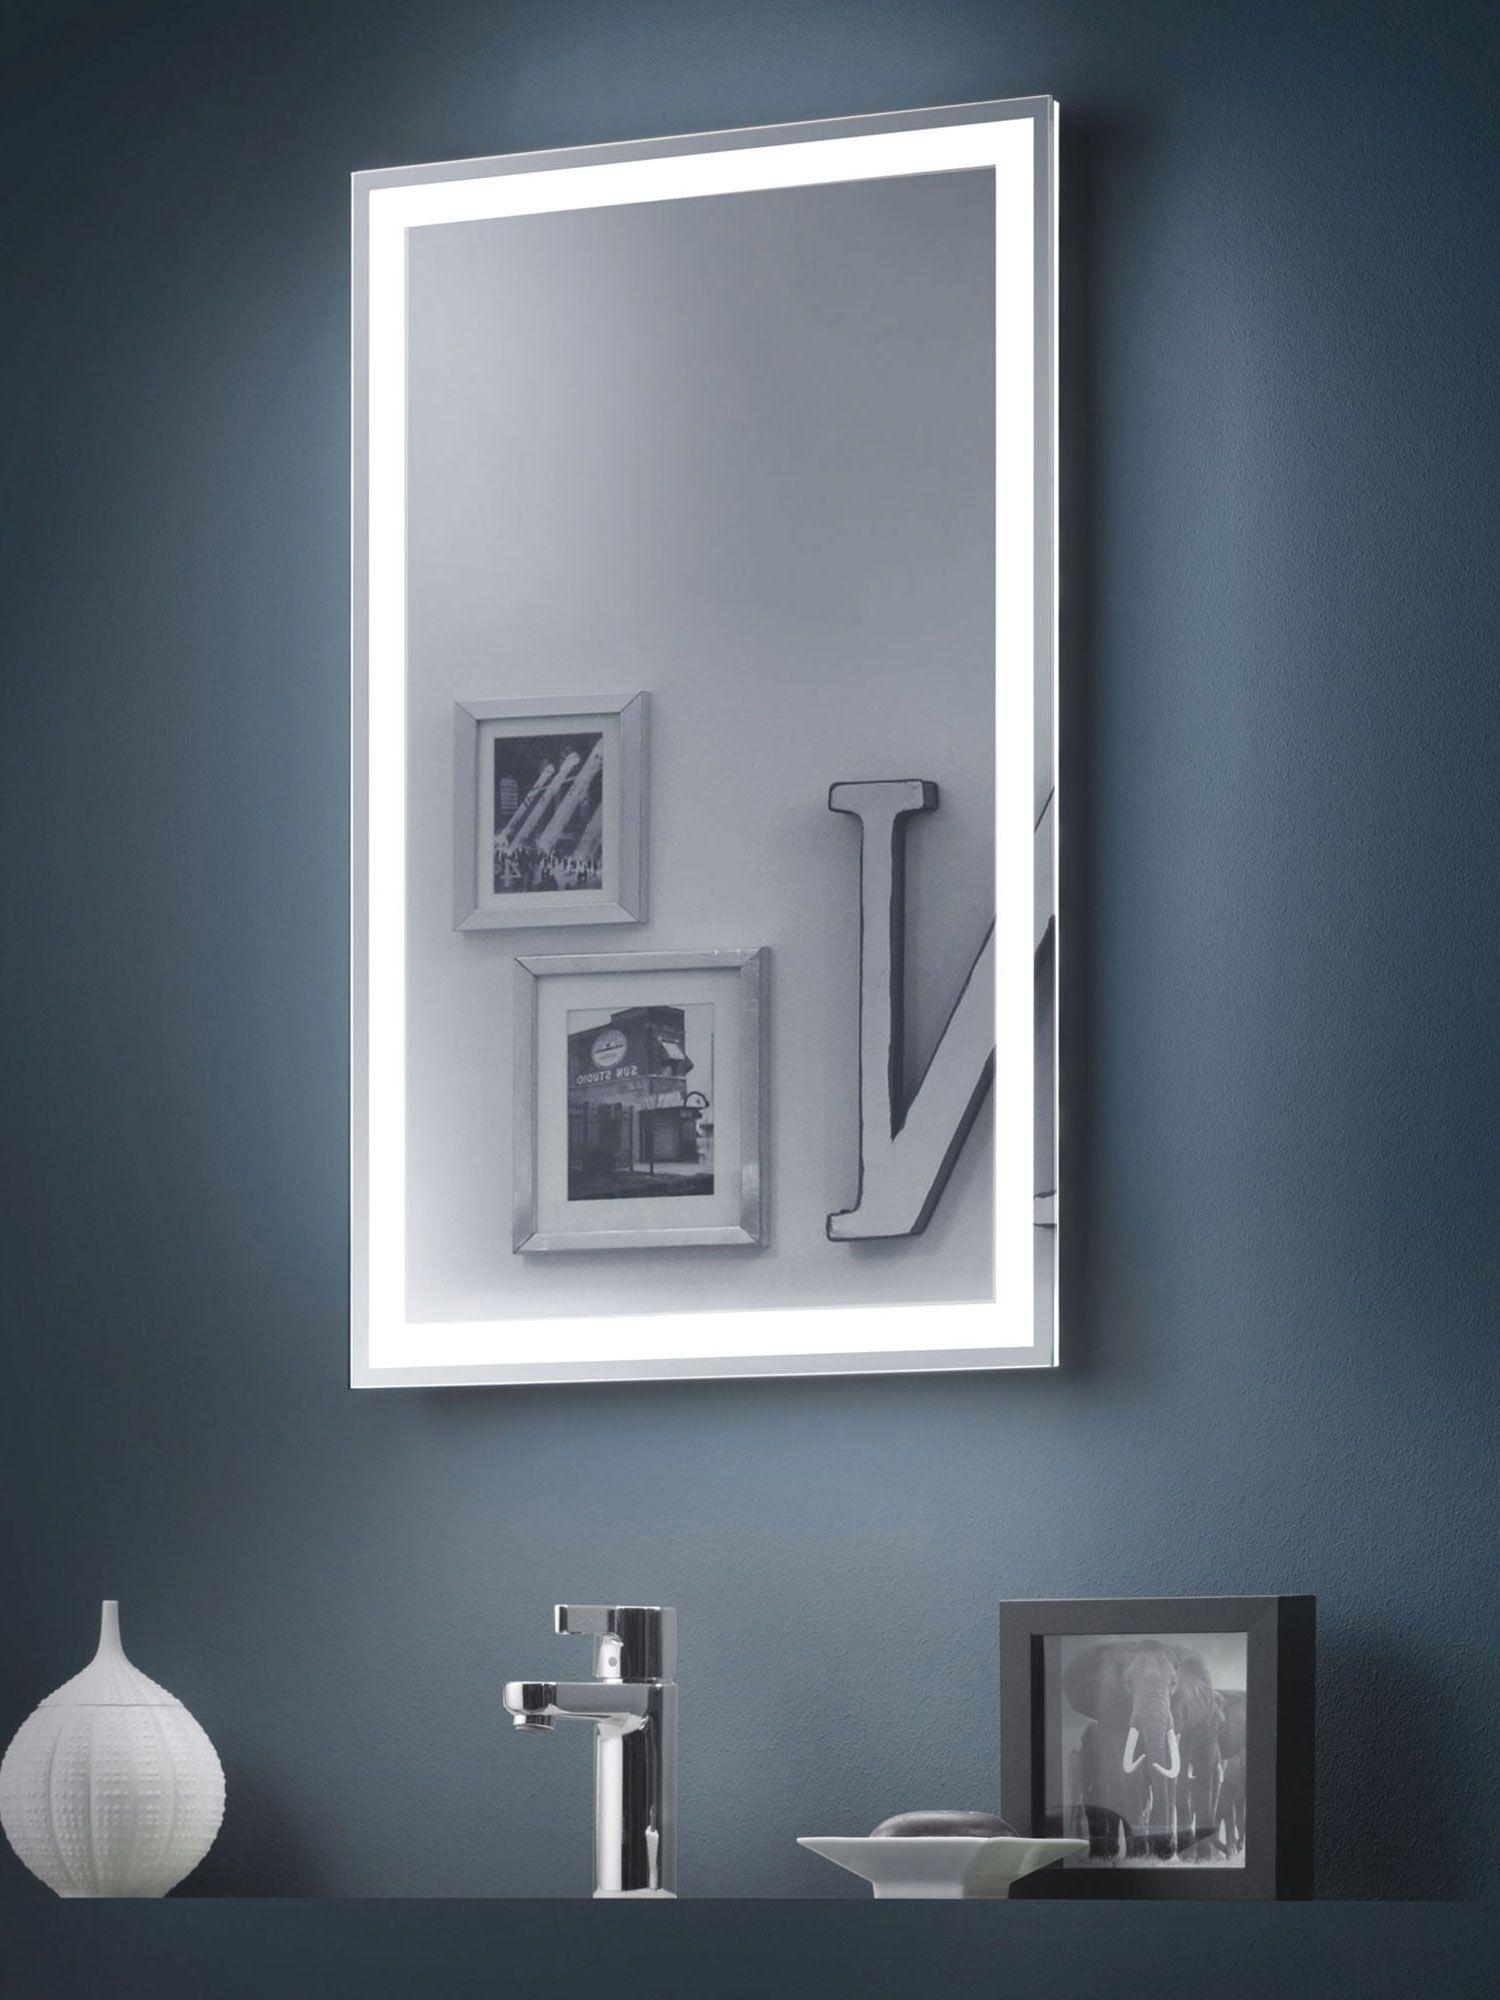 20 inch bathroom mirror harbor freight narrow crown stapler